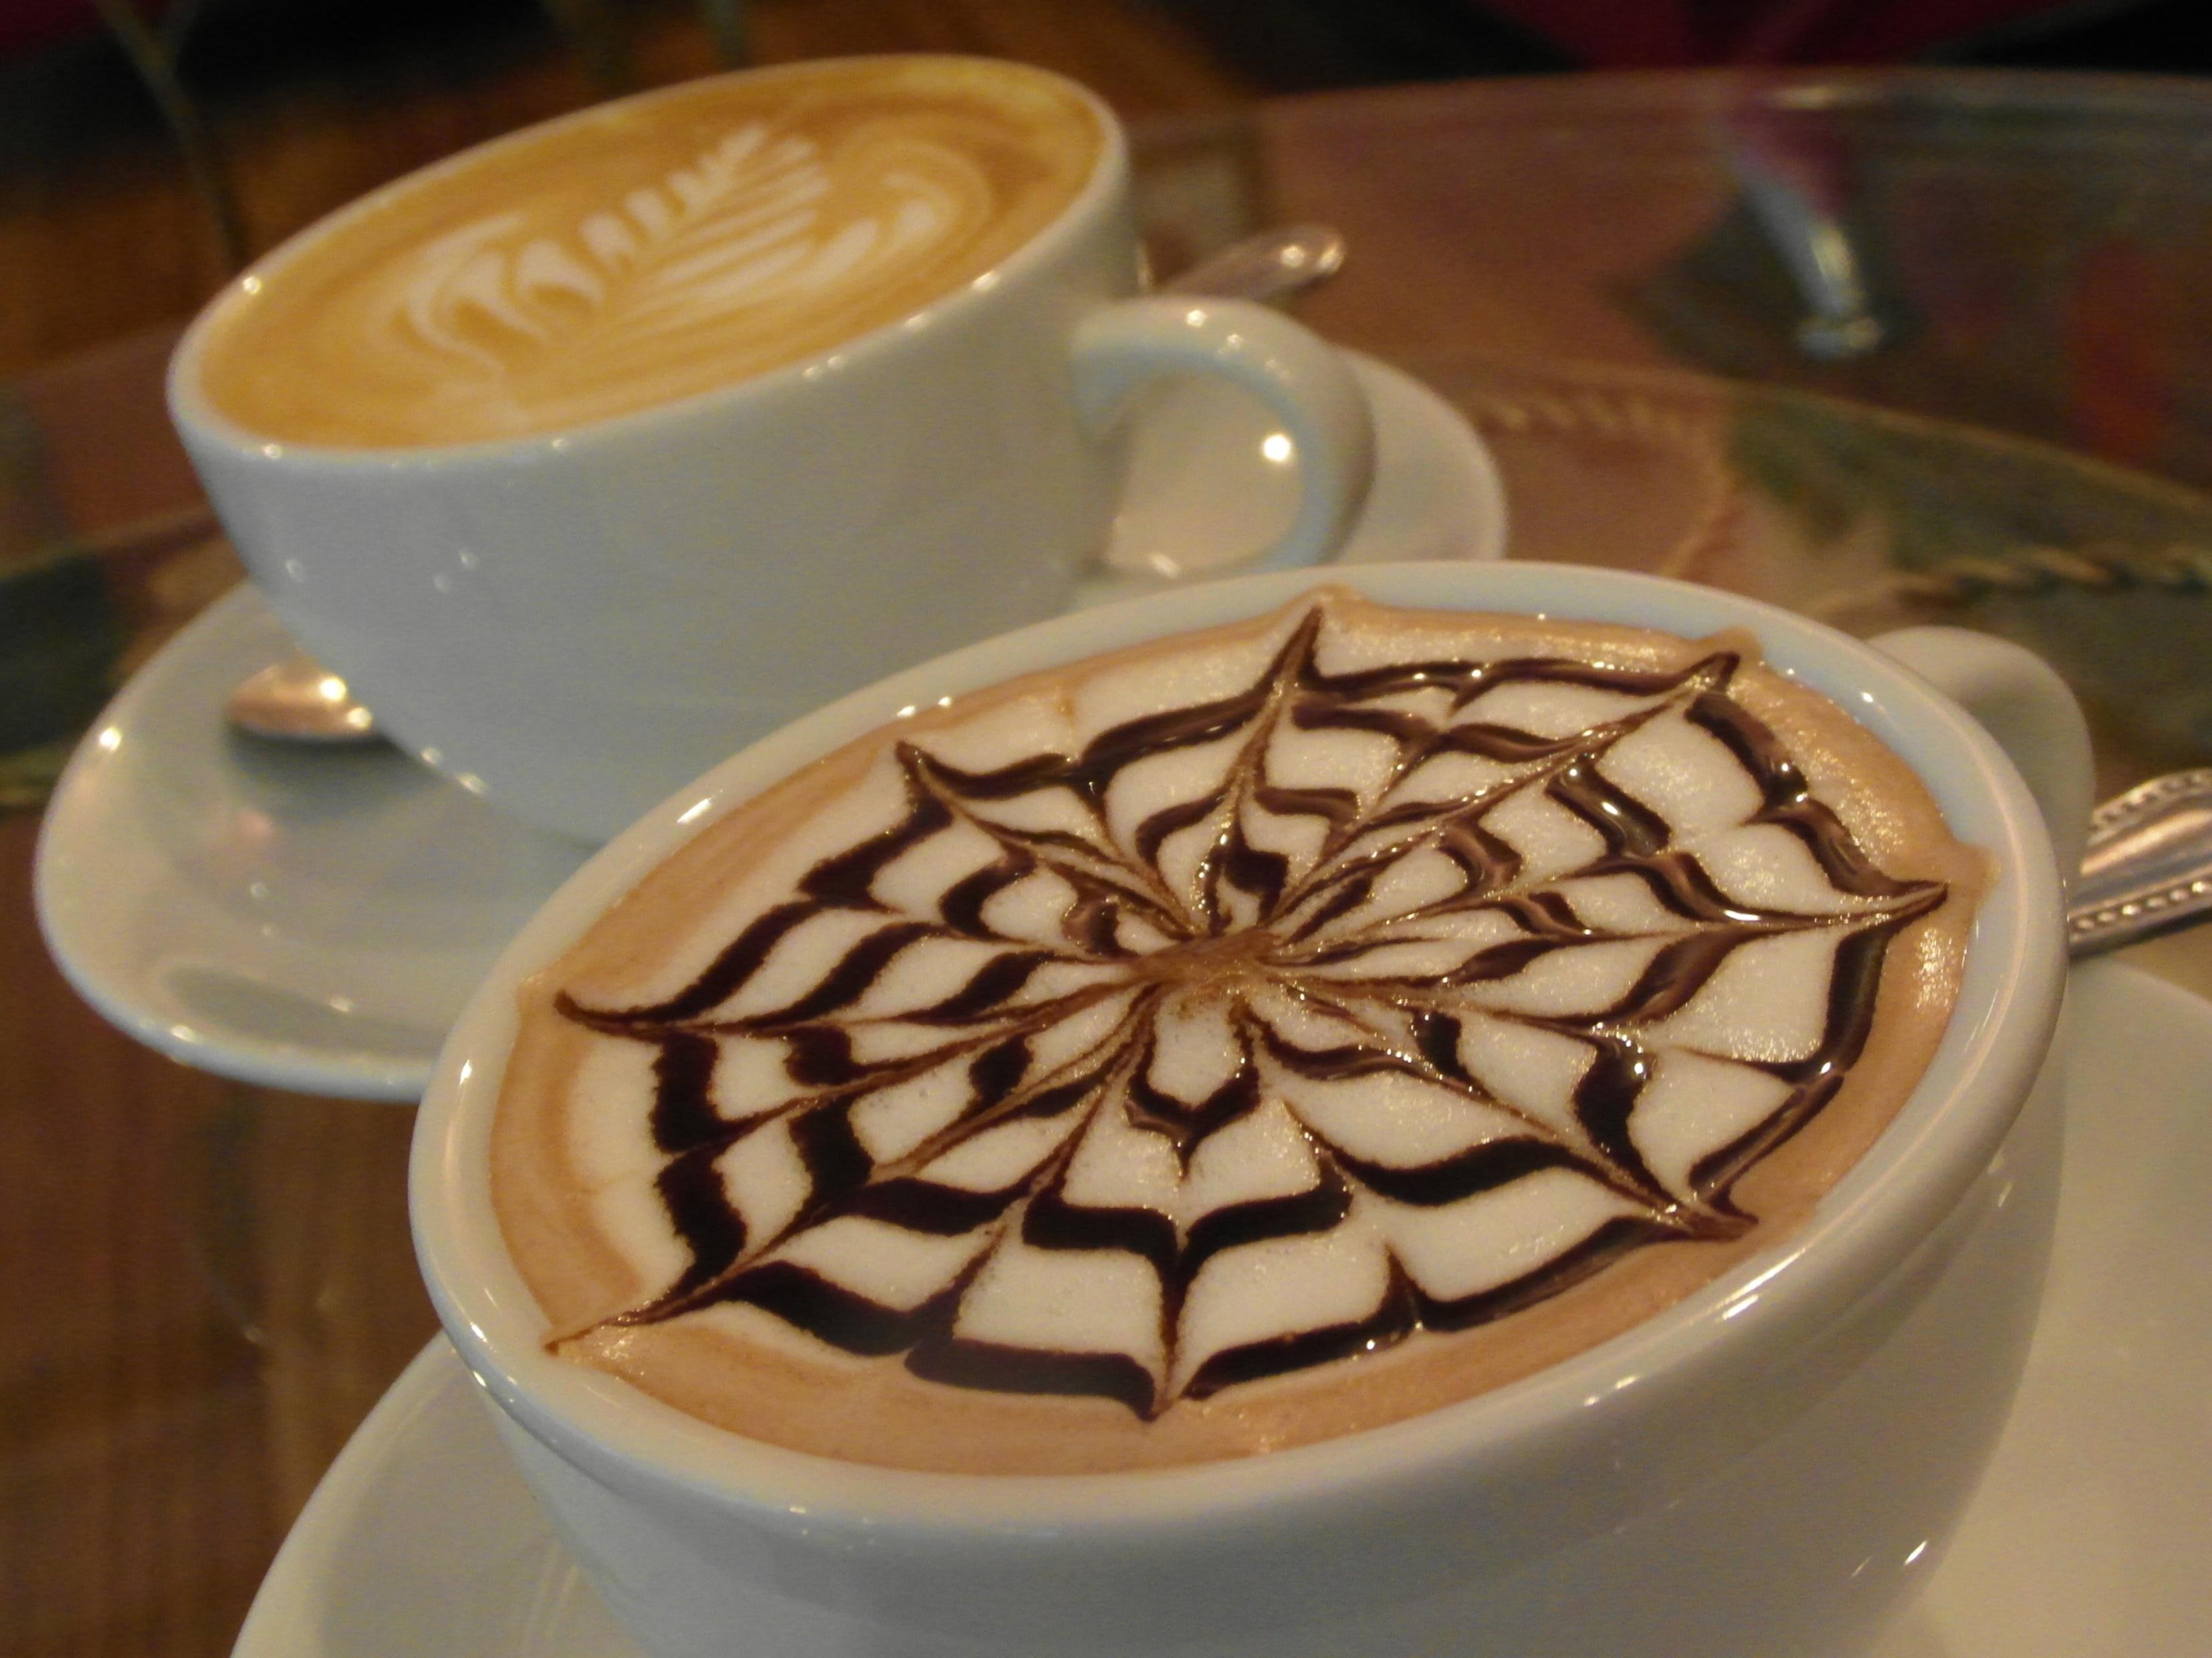 Coffee Art Patterns, Art, Leaf, Foam, Froth, HQ Photo